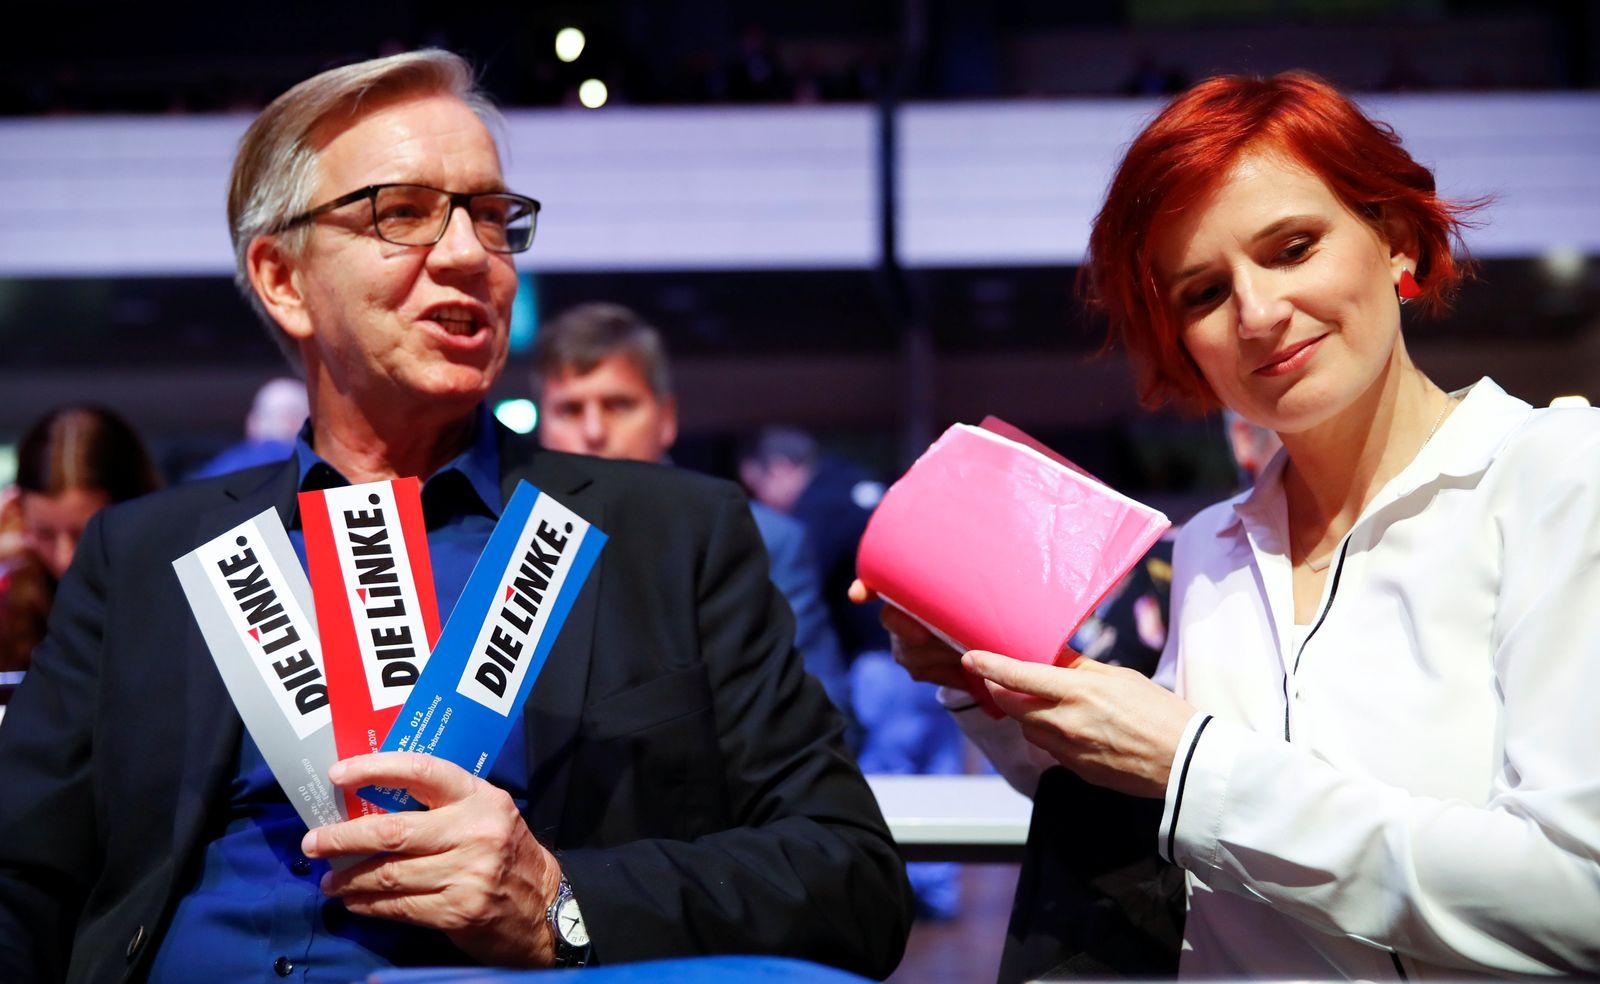 GERMANY-POLITICS/LINKE